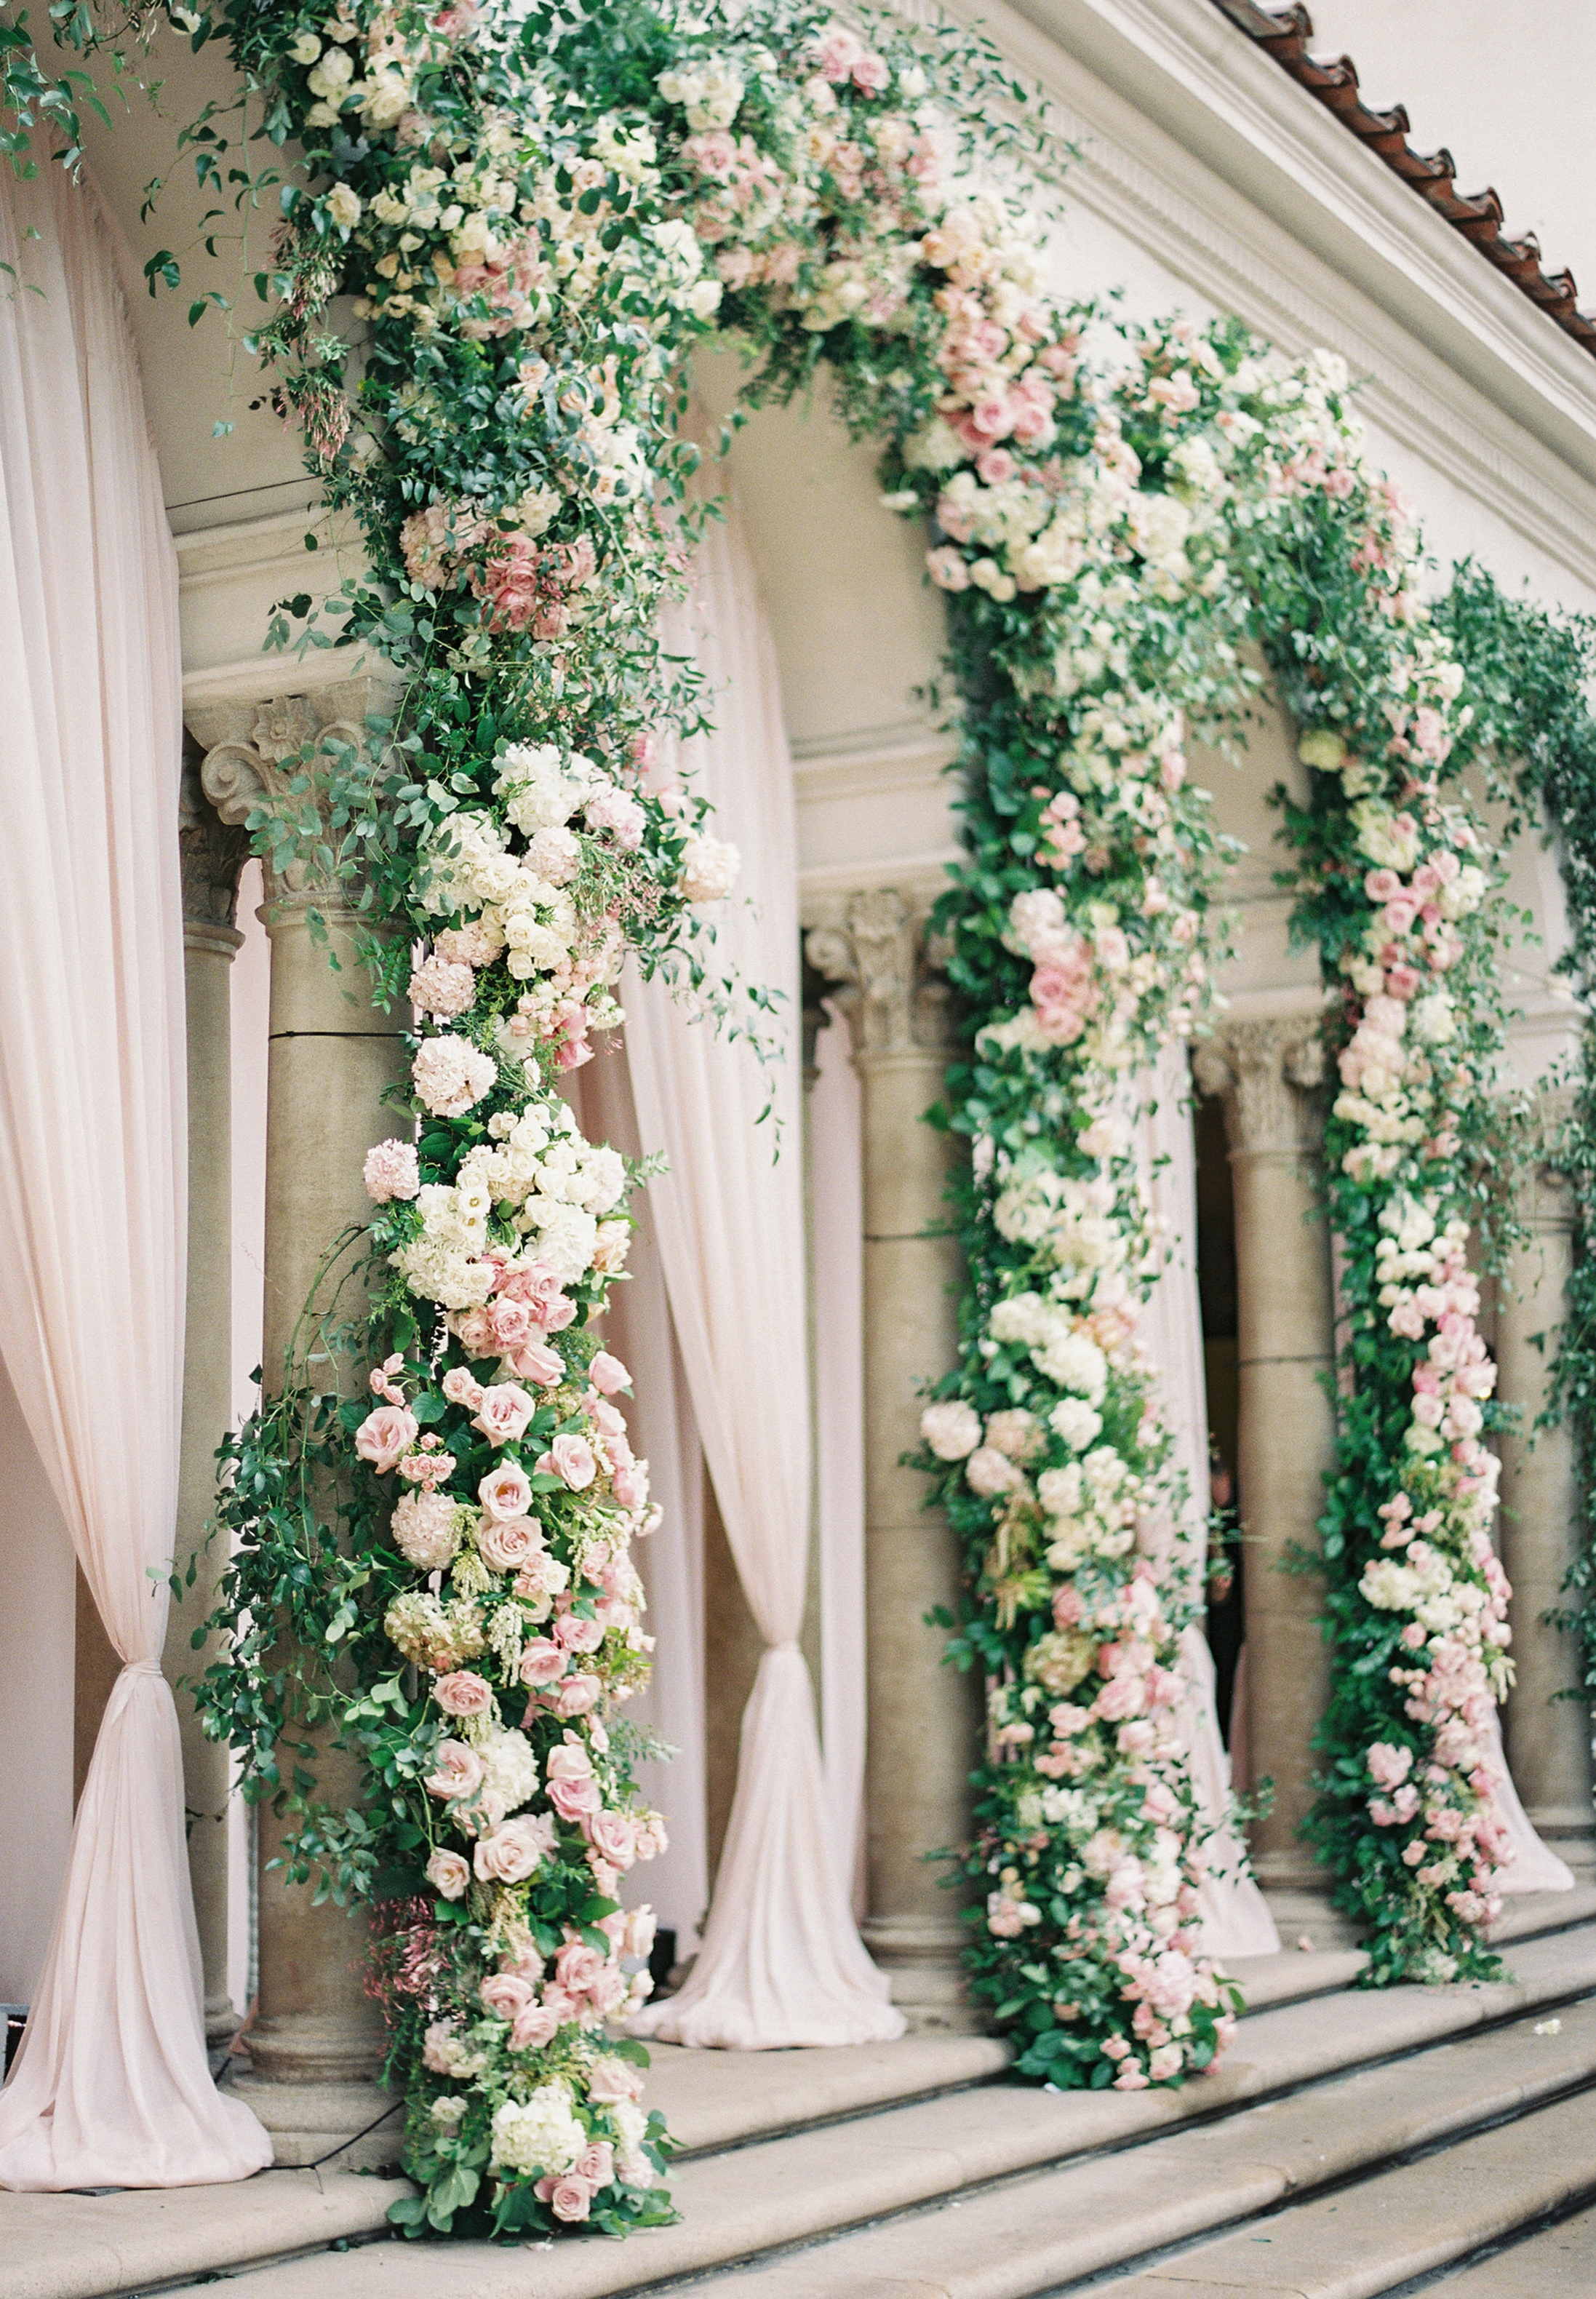 Athenaeum_Wedding_Hi_Res-42-Jen_Huang-005187-R1-014.jpg